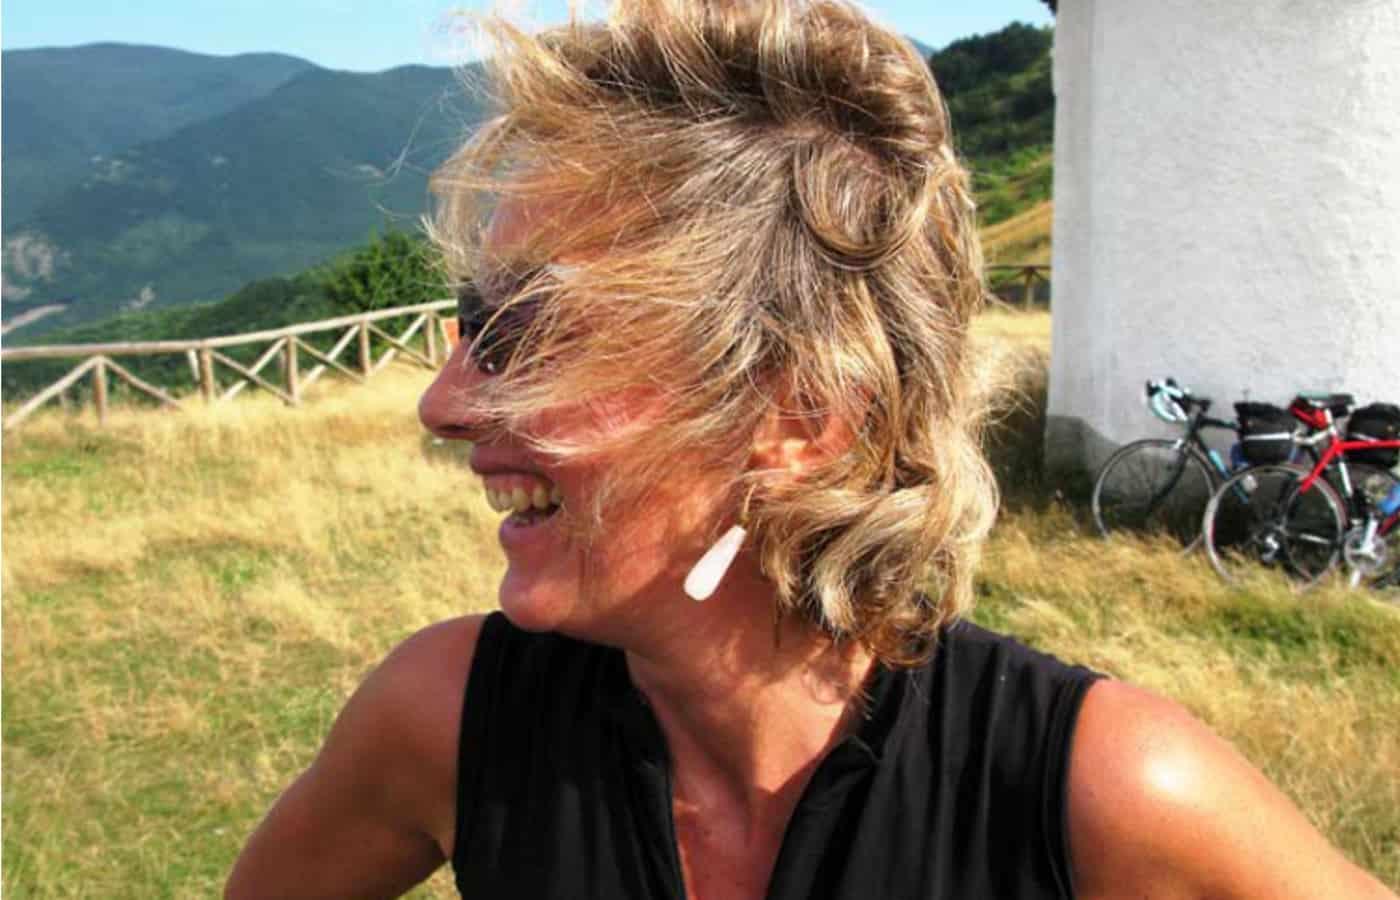 Da Fidenza a Varese Ligure